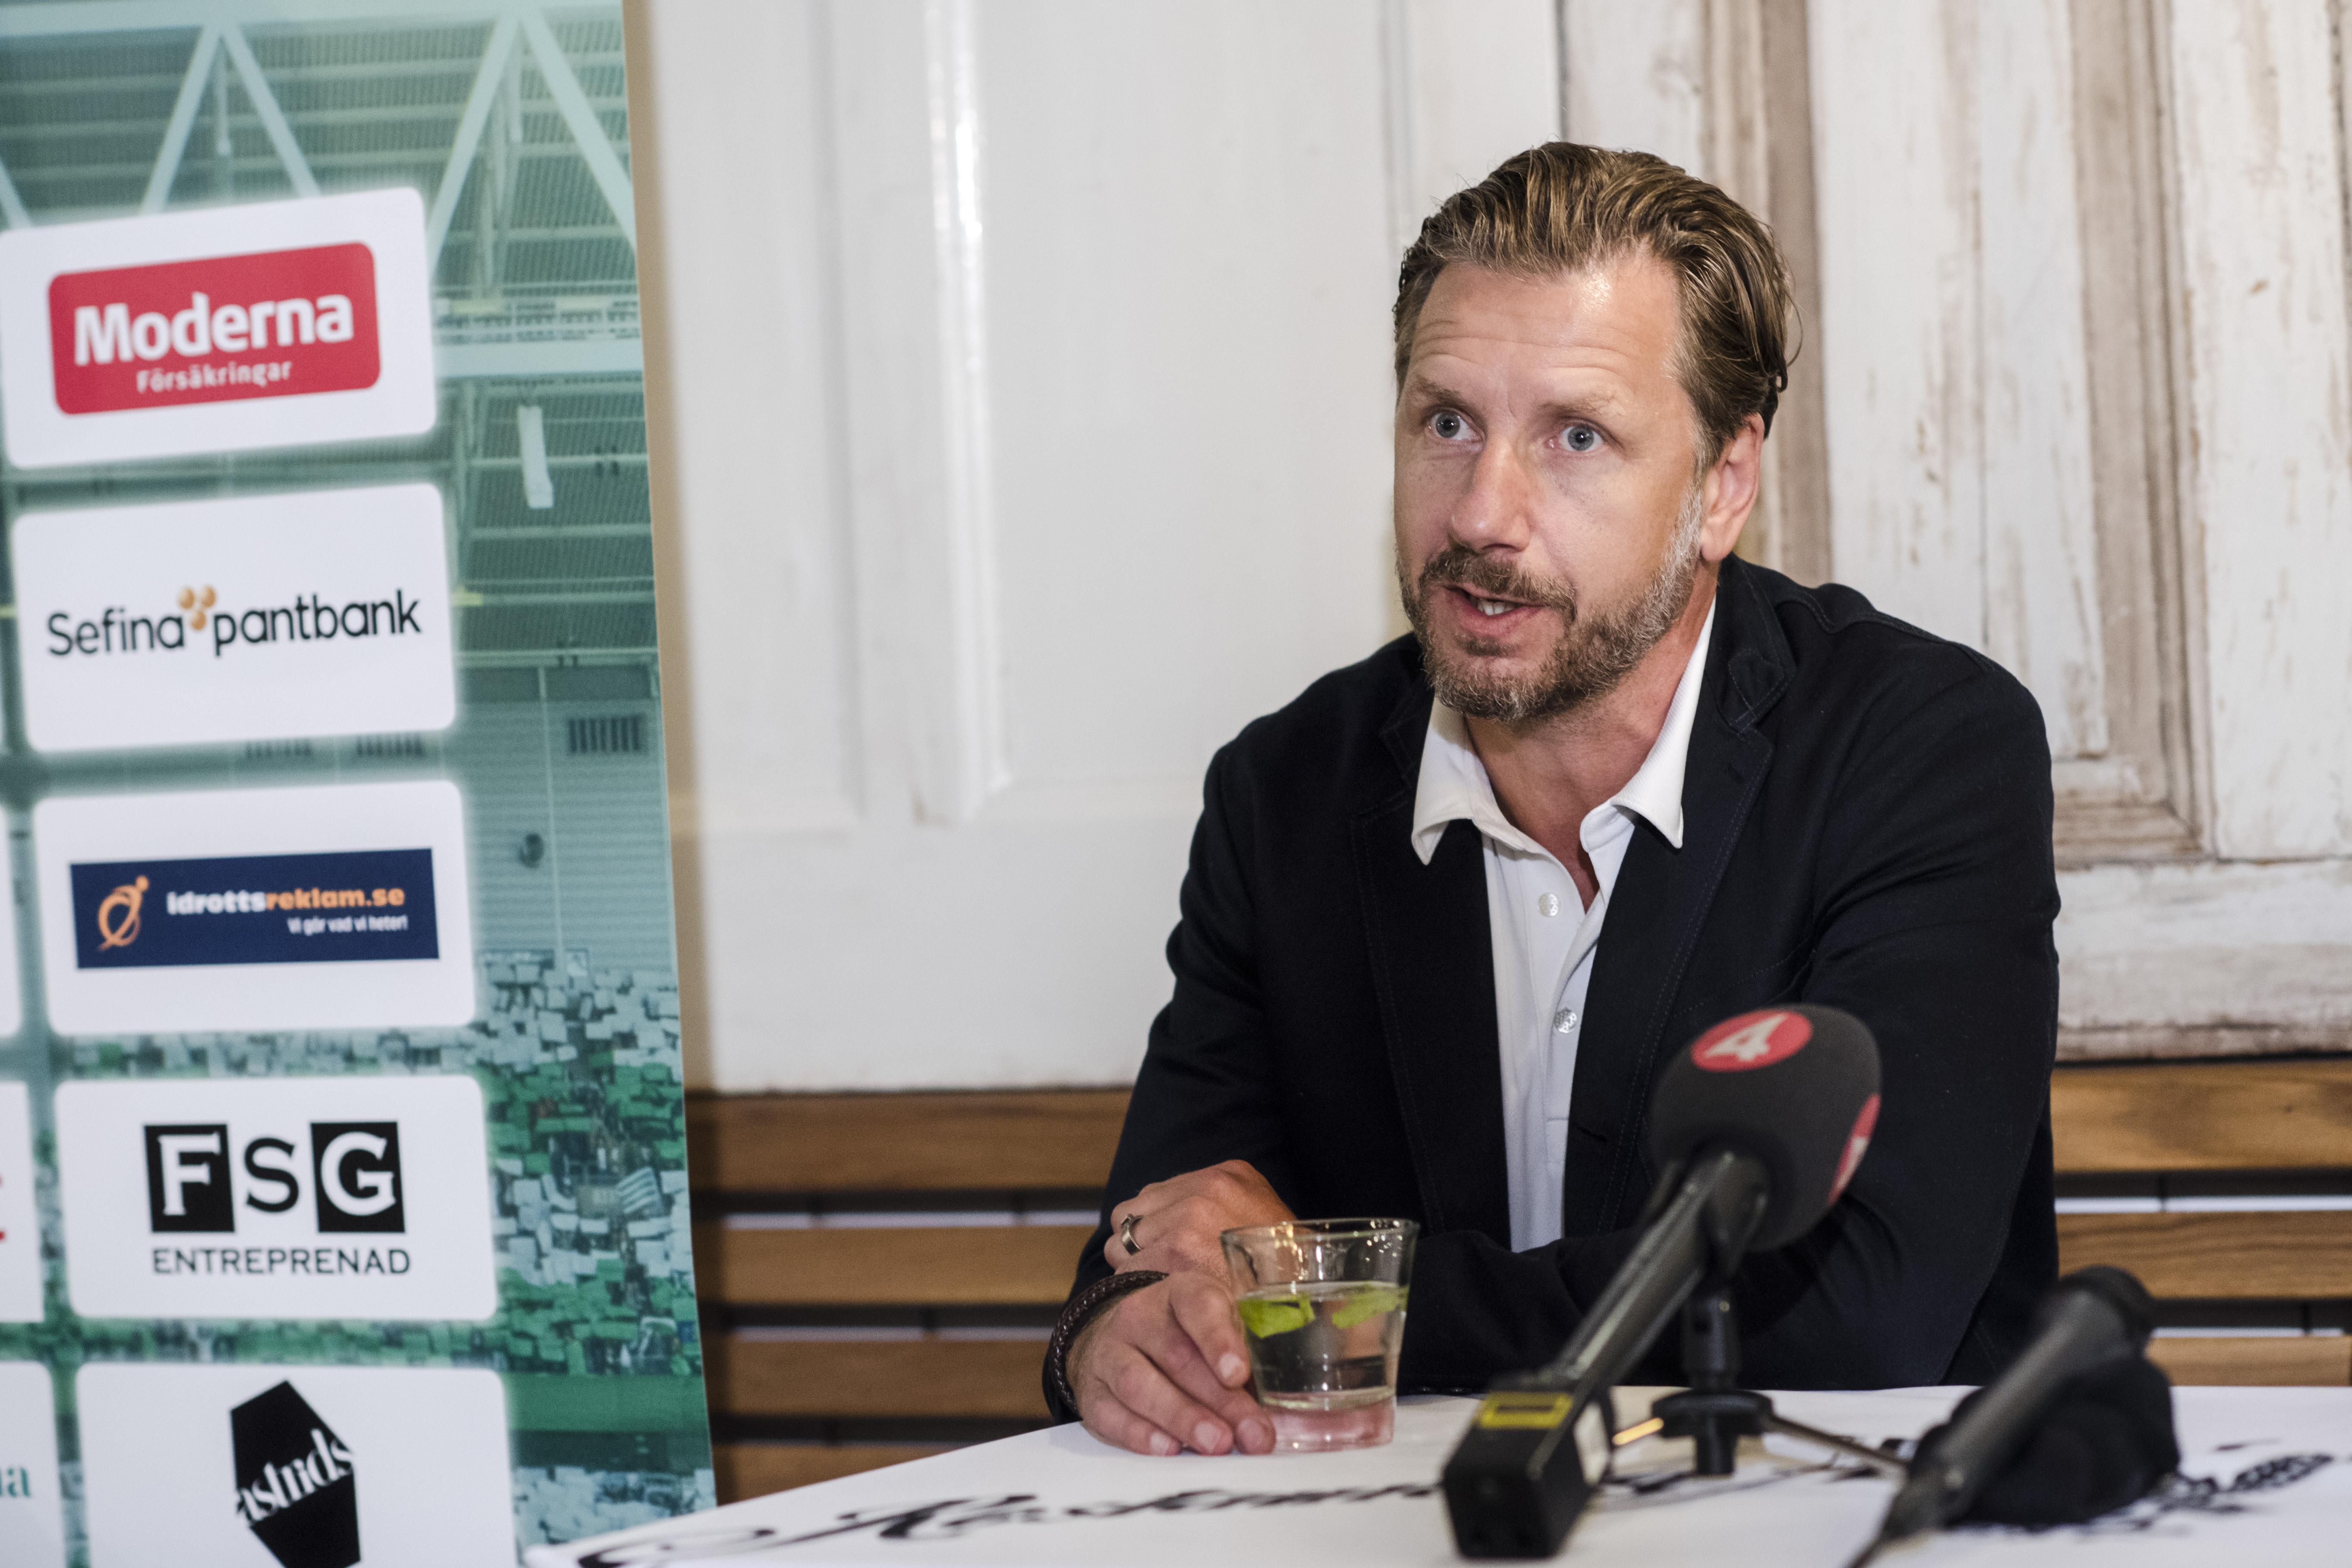 170630  Hammarby sportchef Jesper Jansson under en presskonferens pŒ restaurang Kvarnen den 30 juni 2017 i Stockholm. Foto: Simon HastegŒrd / BildbyrŒn / Cop 118